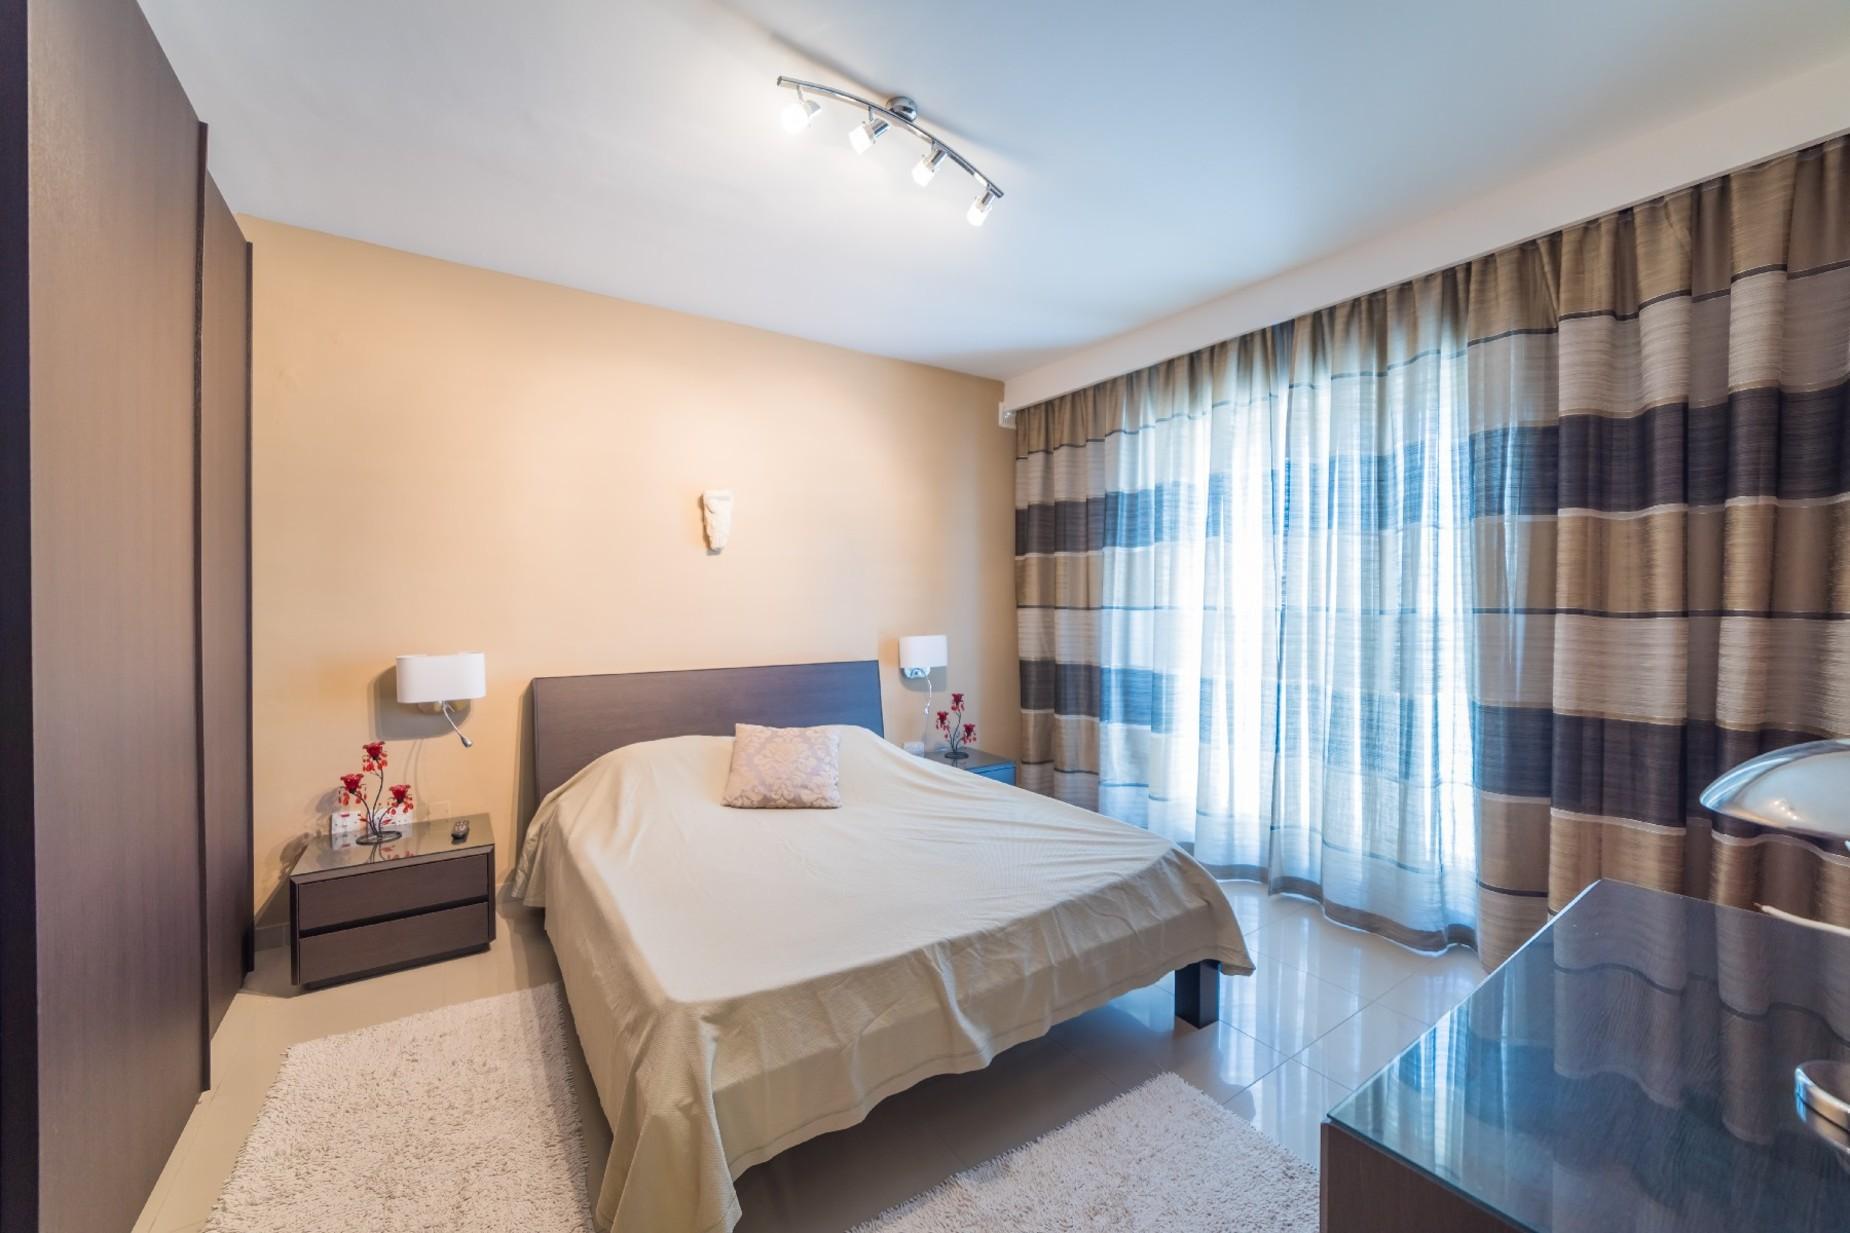 3 bed Penthouse For Rent in Lija, Lija - thumb 3